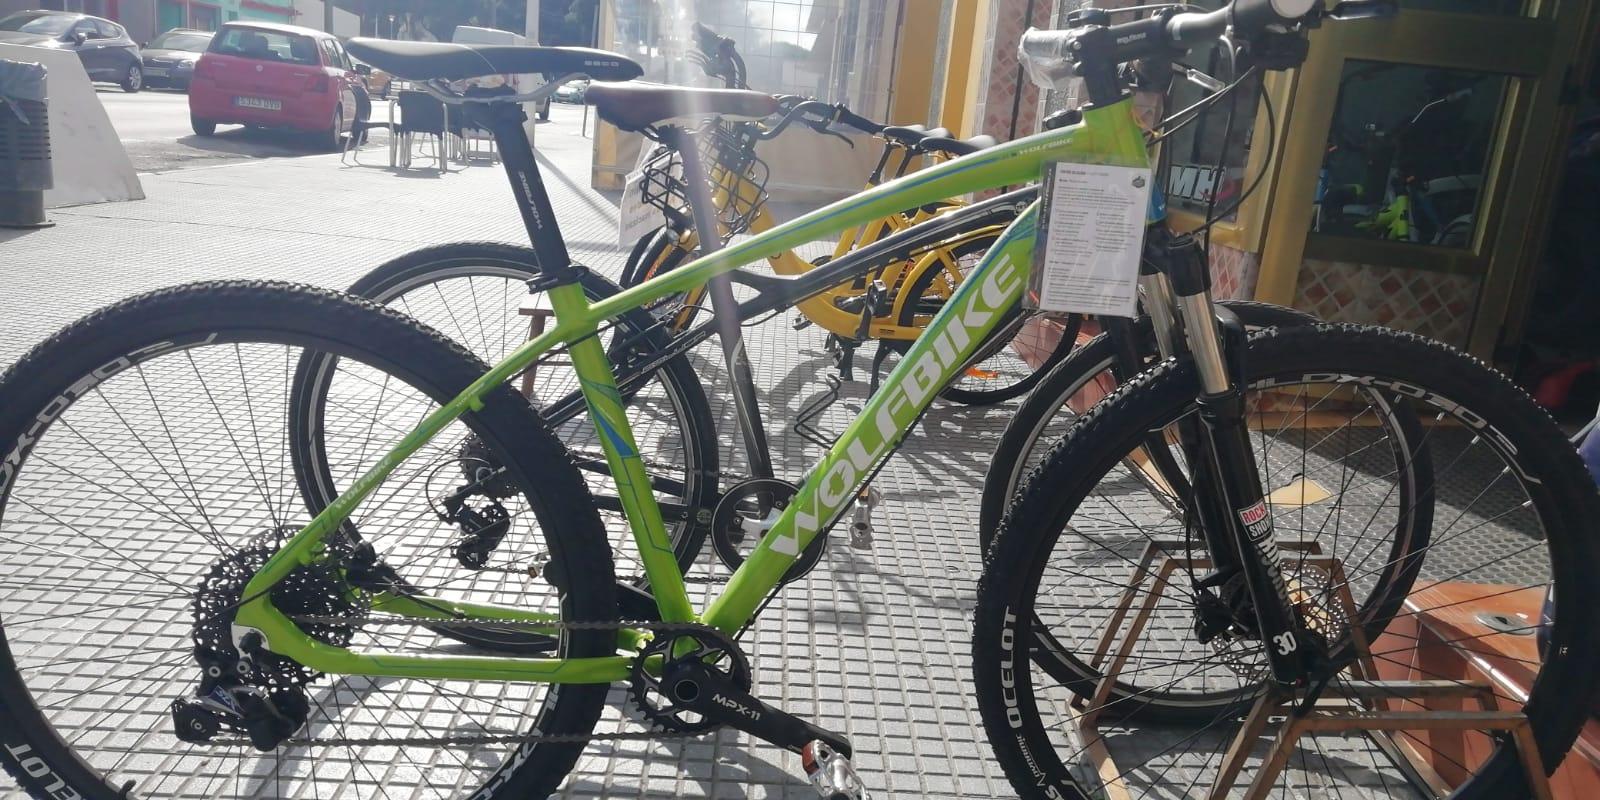 alquiler de bicis en punta umbria bermejo 002